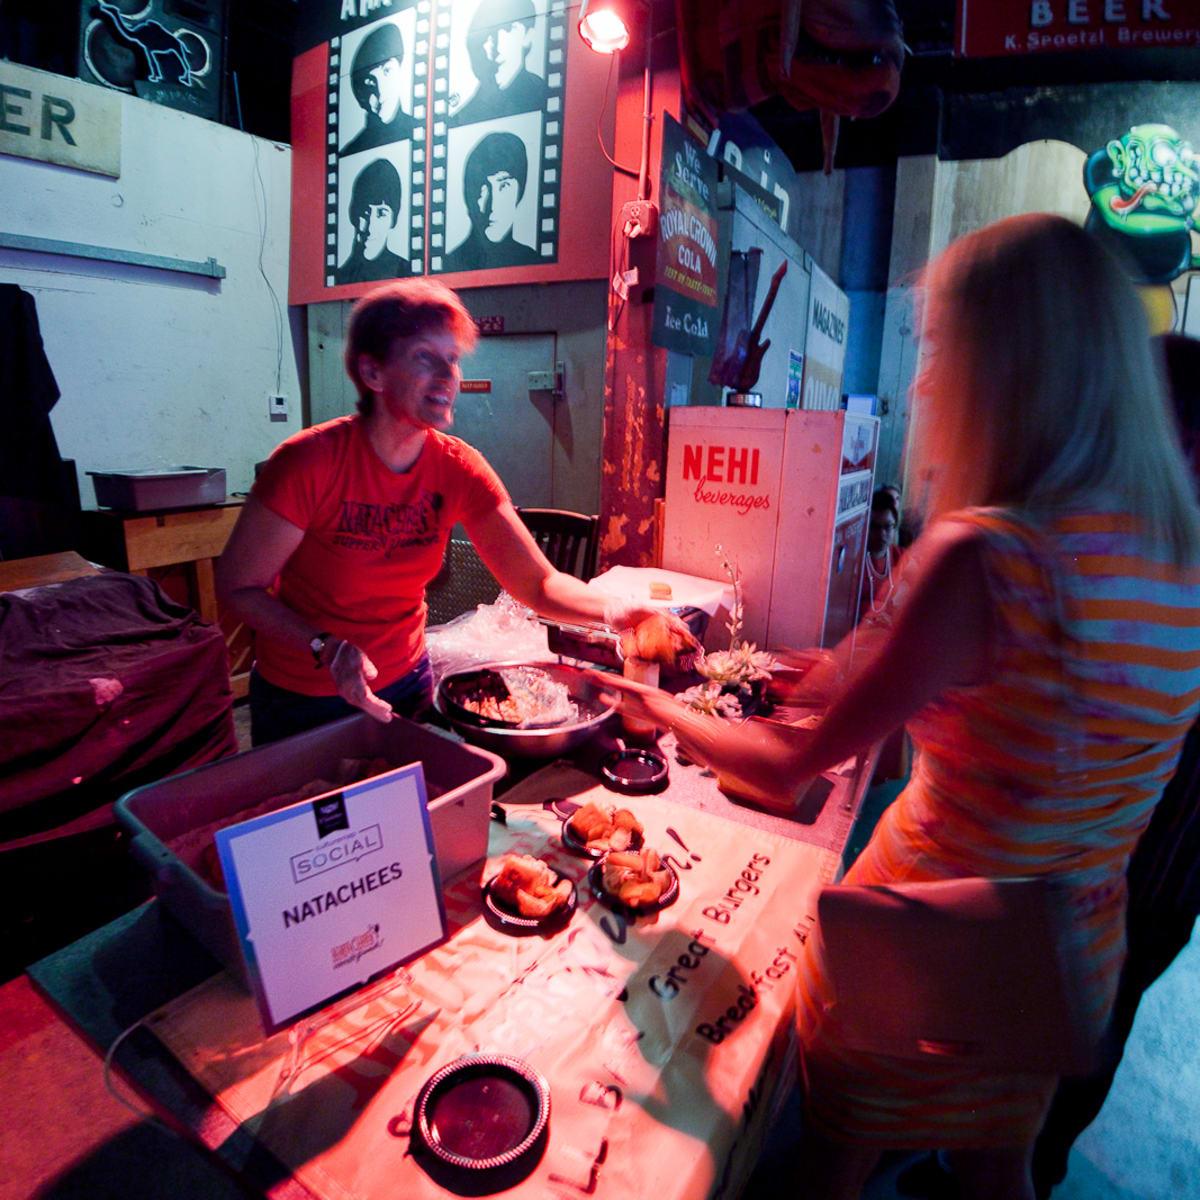 Houston, CultureMap Social, June 2015, natachees